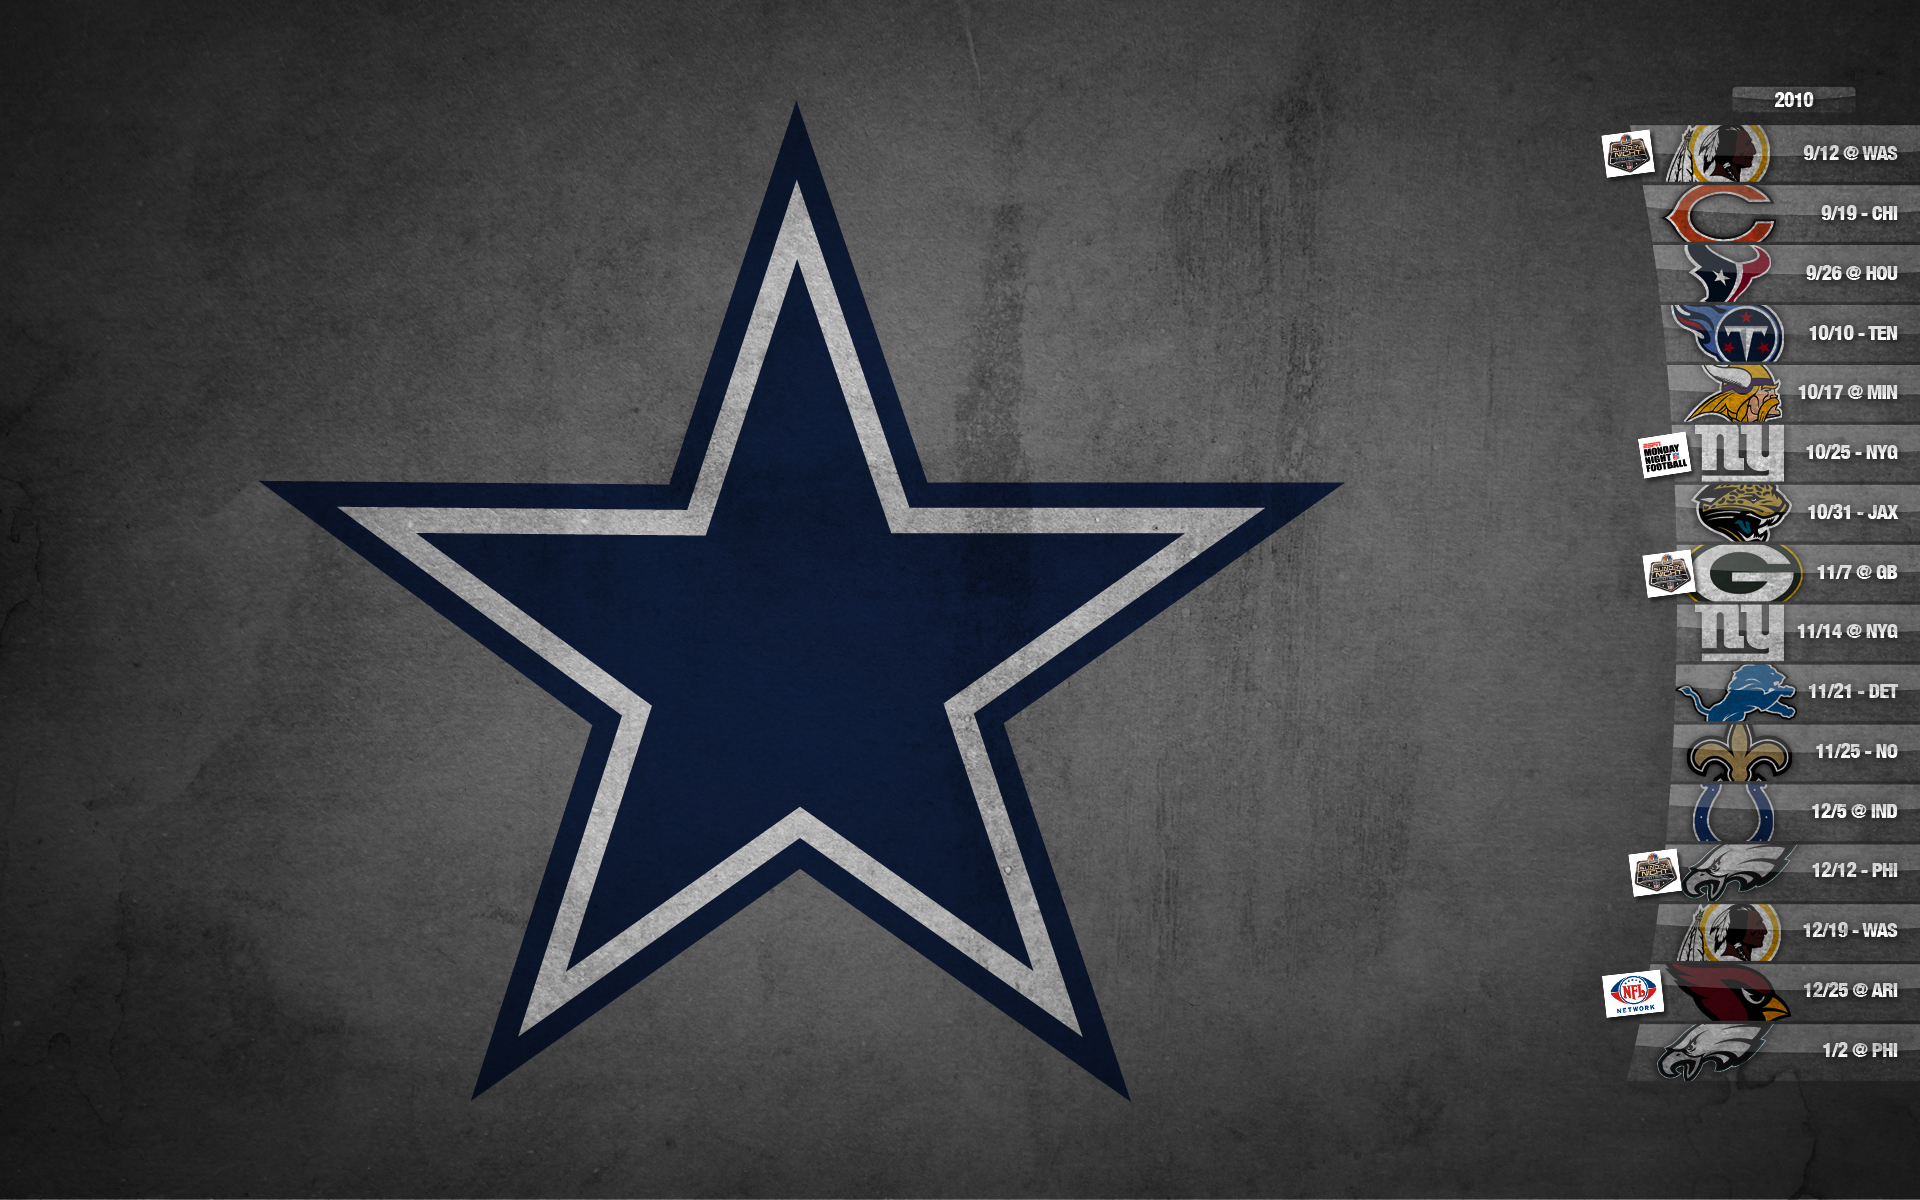 Dallas Cowboys Schedule Desktop Wallpaper Wallpaper 1920x1200